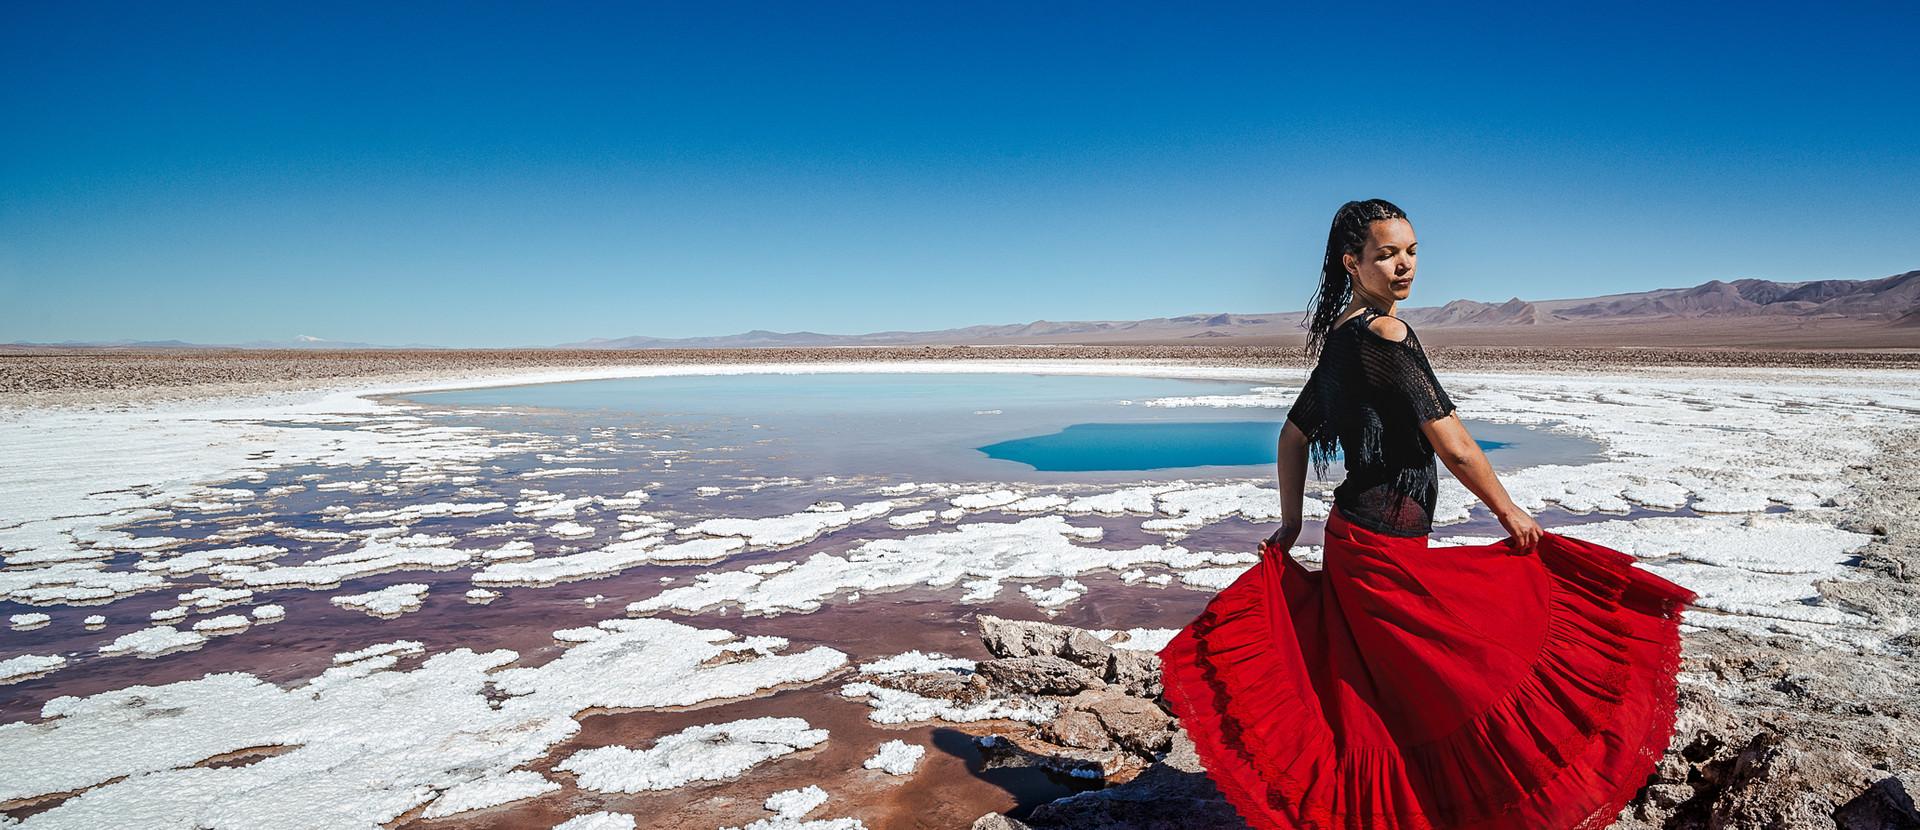 retrato portrait mujer bailando desierto de atacama desert woman dancing skirt dress blue skies lagunas escondidas baltinache lagoon blue salt flats salar white